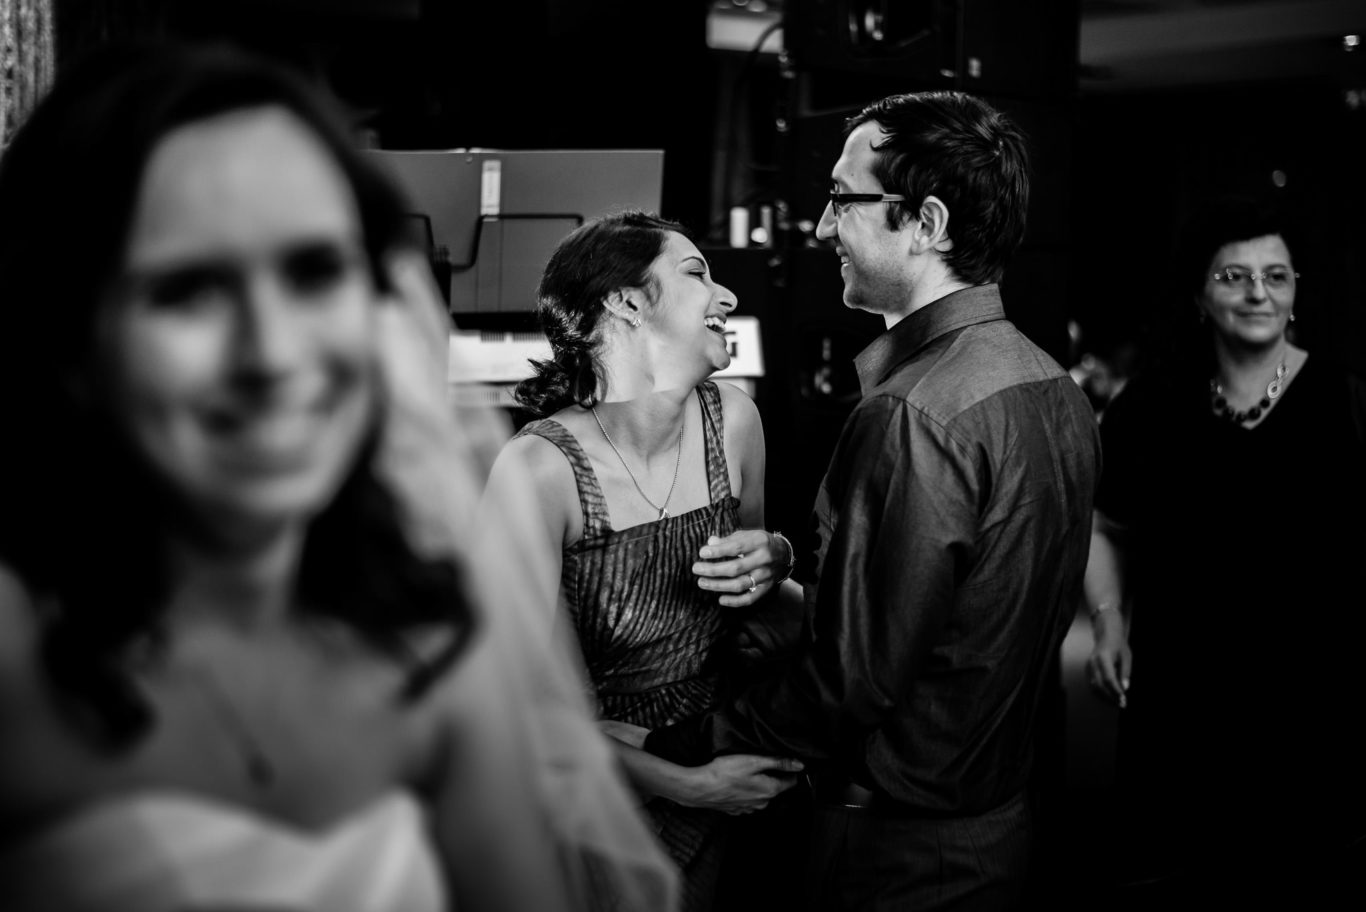 0836-Fotografie-nunta-Simona-Valentin-fotograf-Ciprian-Dumitrescu-DSC_2482